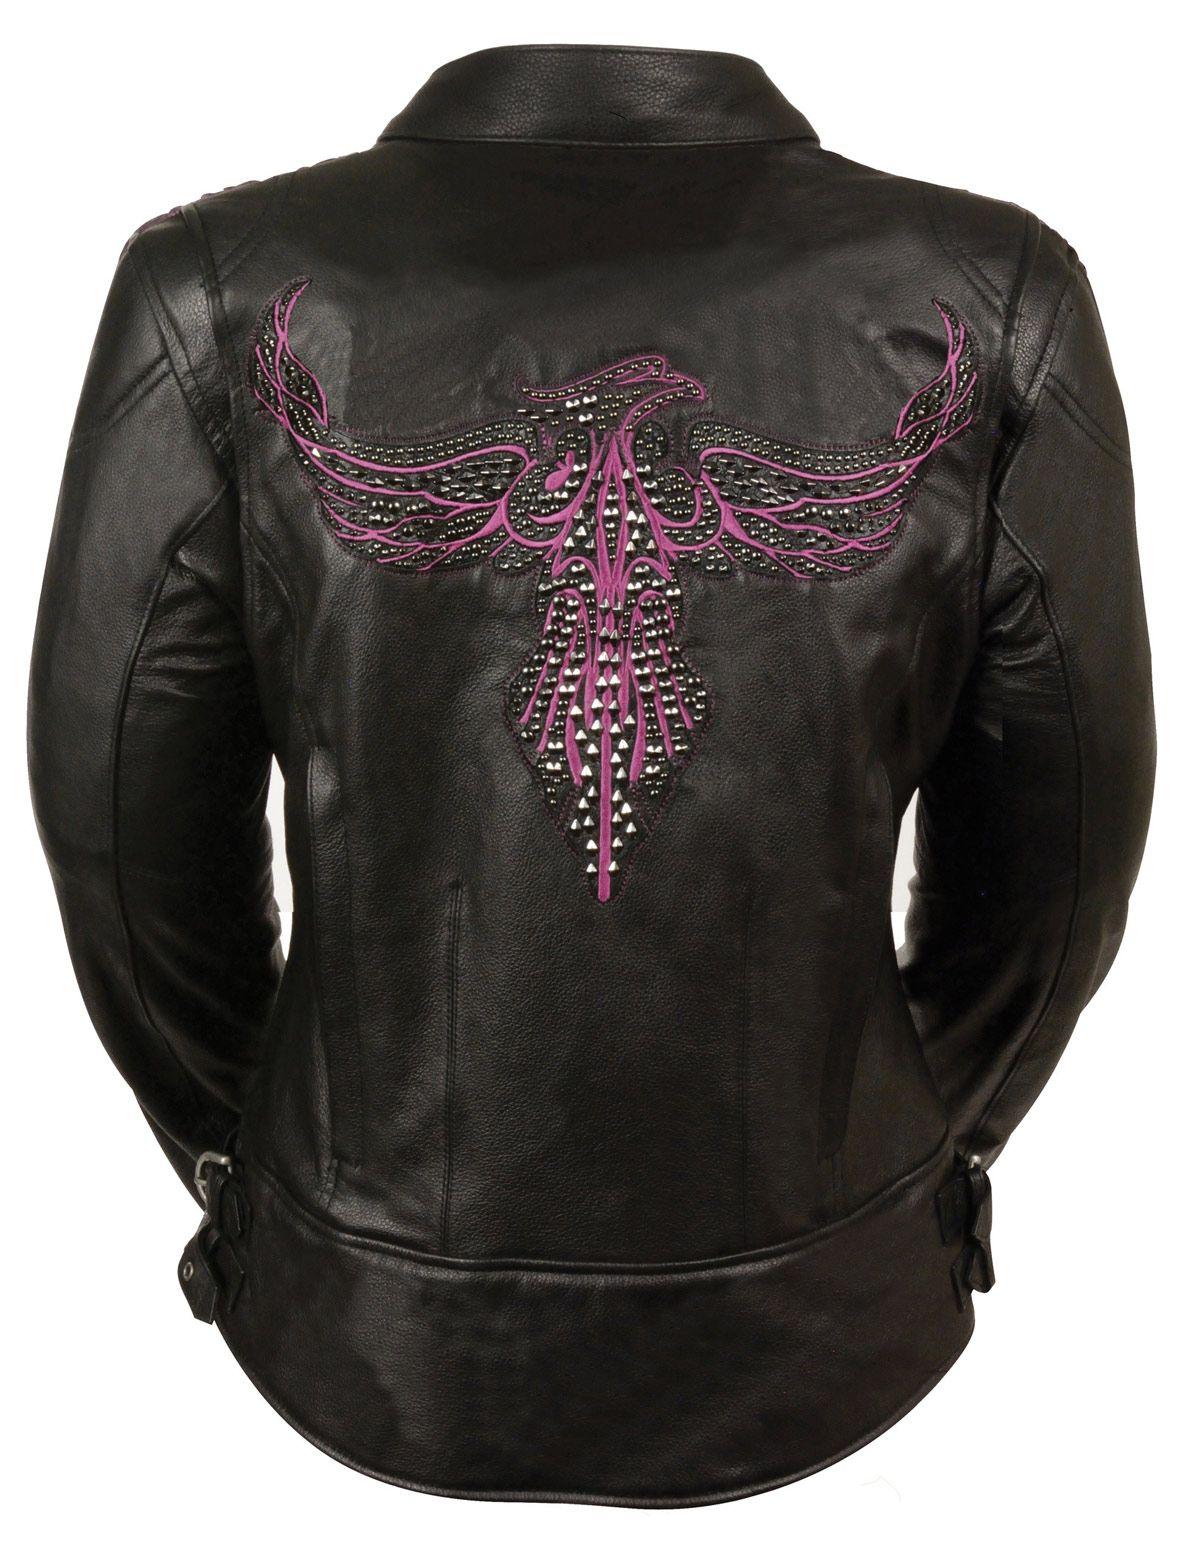 8ae68f20a Ladies Black Leather Biker Jacket w Hot Pink Phoenix Embroidery ...